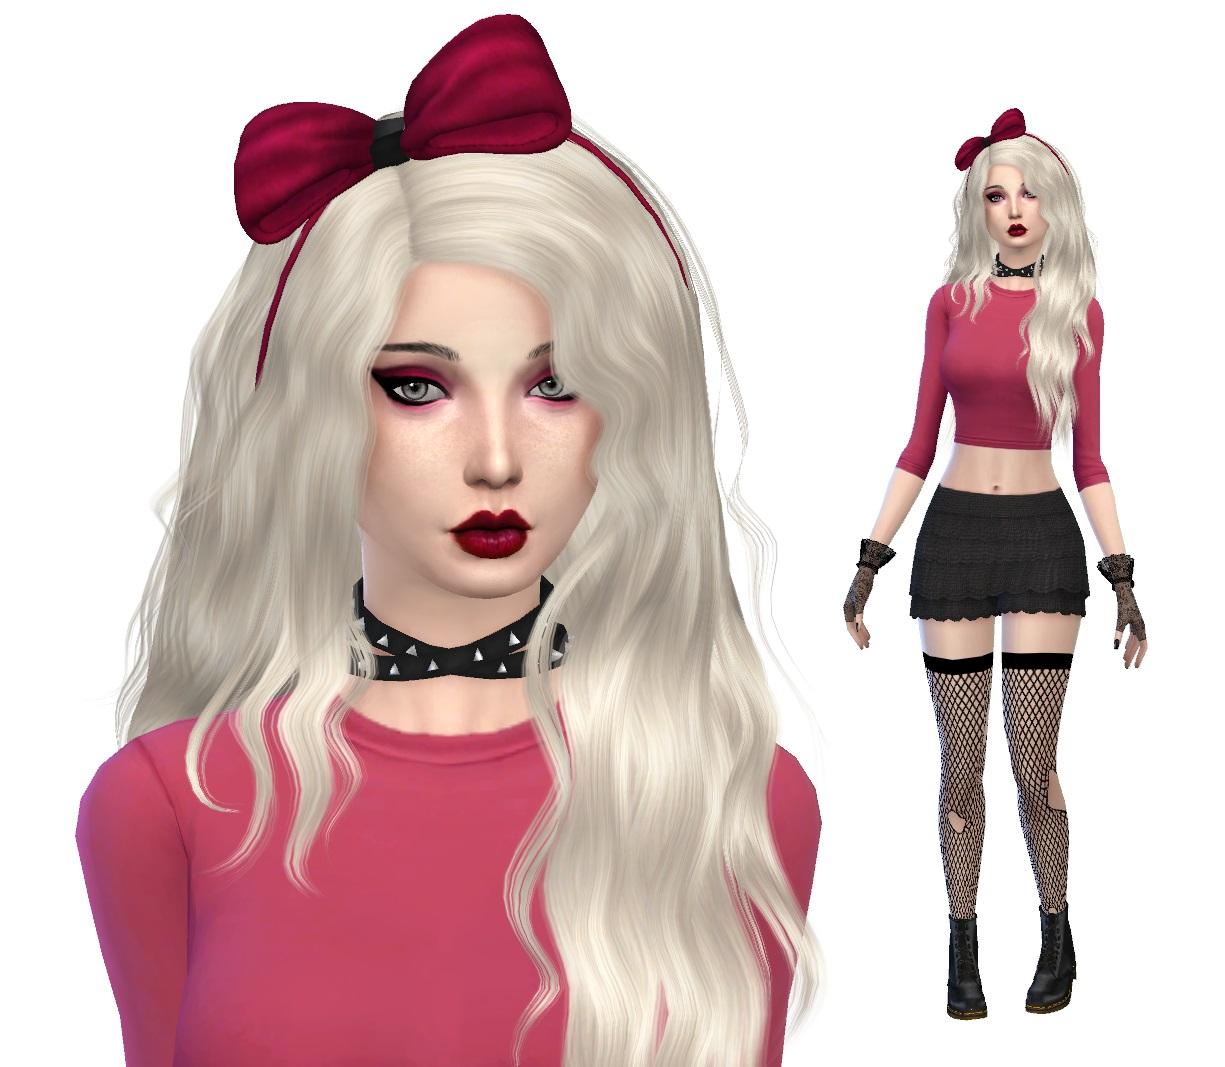 The Sims 4 Wallpaper CC